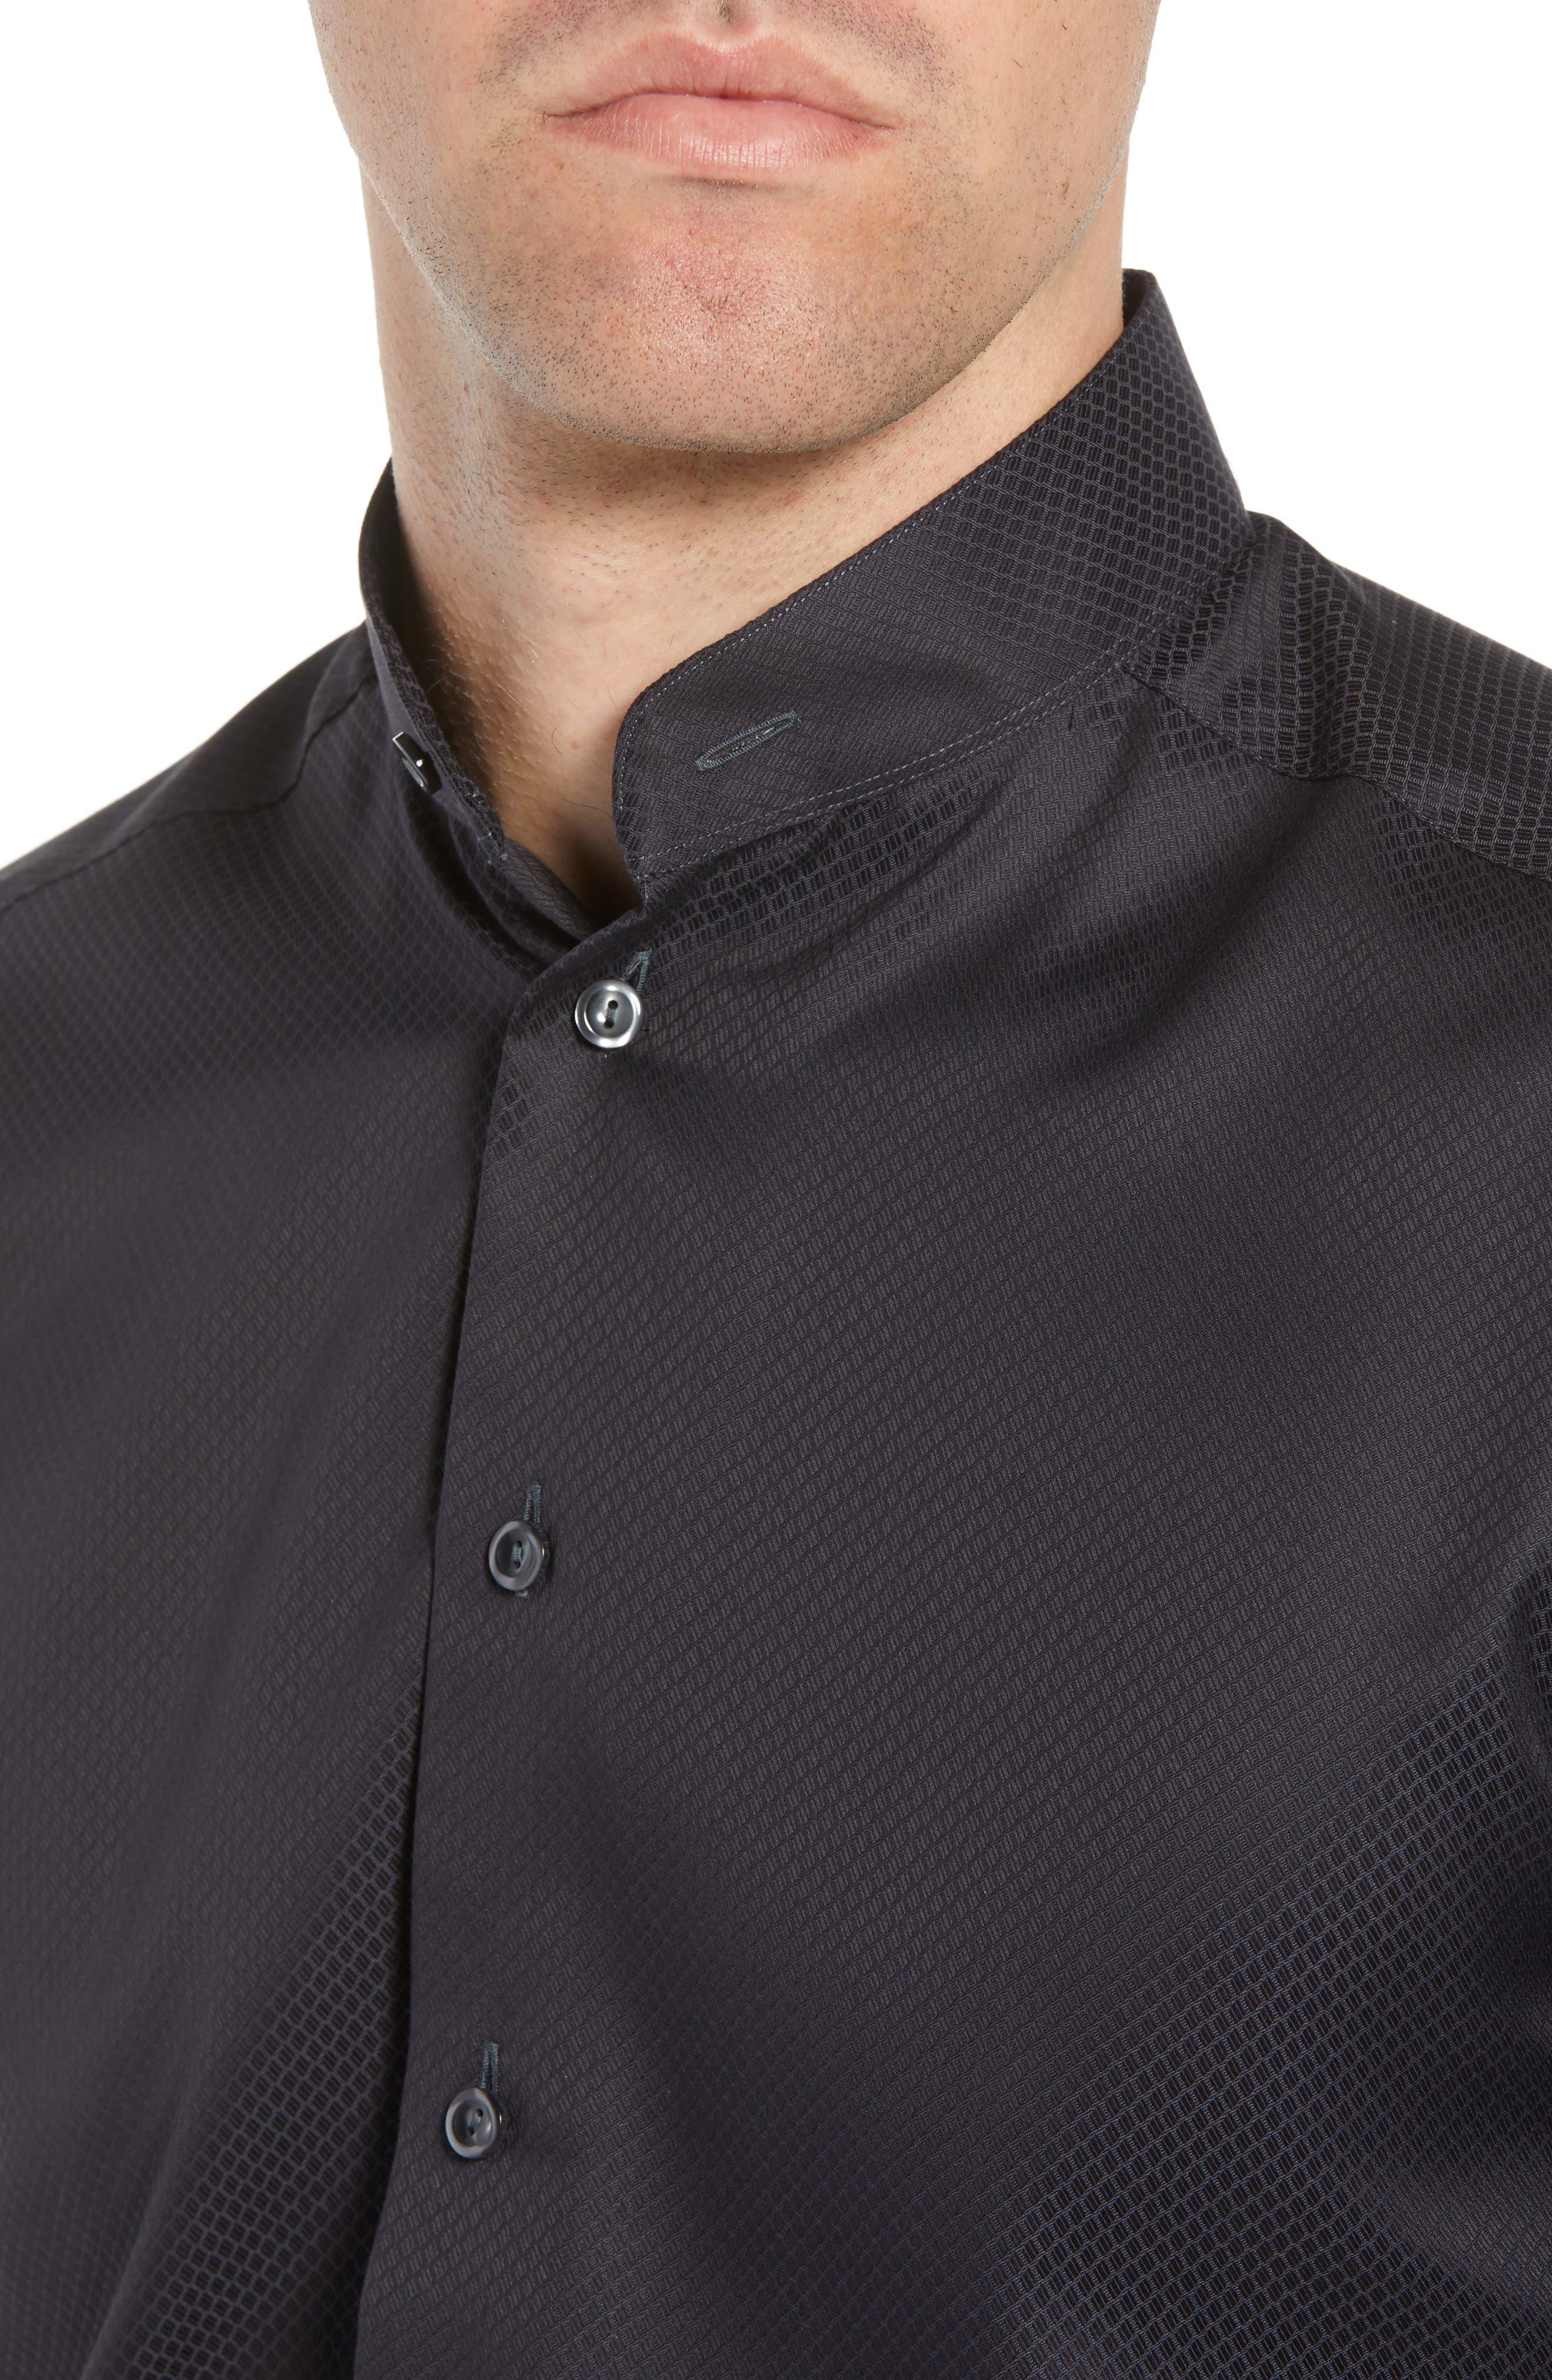 Slim Fit Solid Dress Shirt,                             Alternate thumbnail 2, color,                             Black